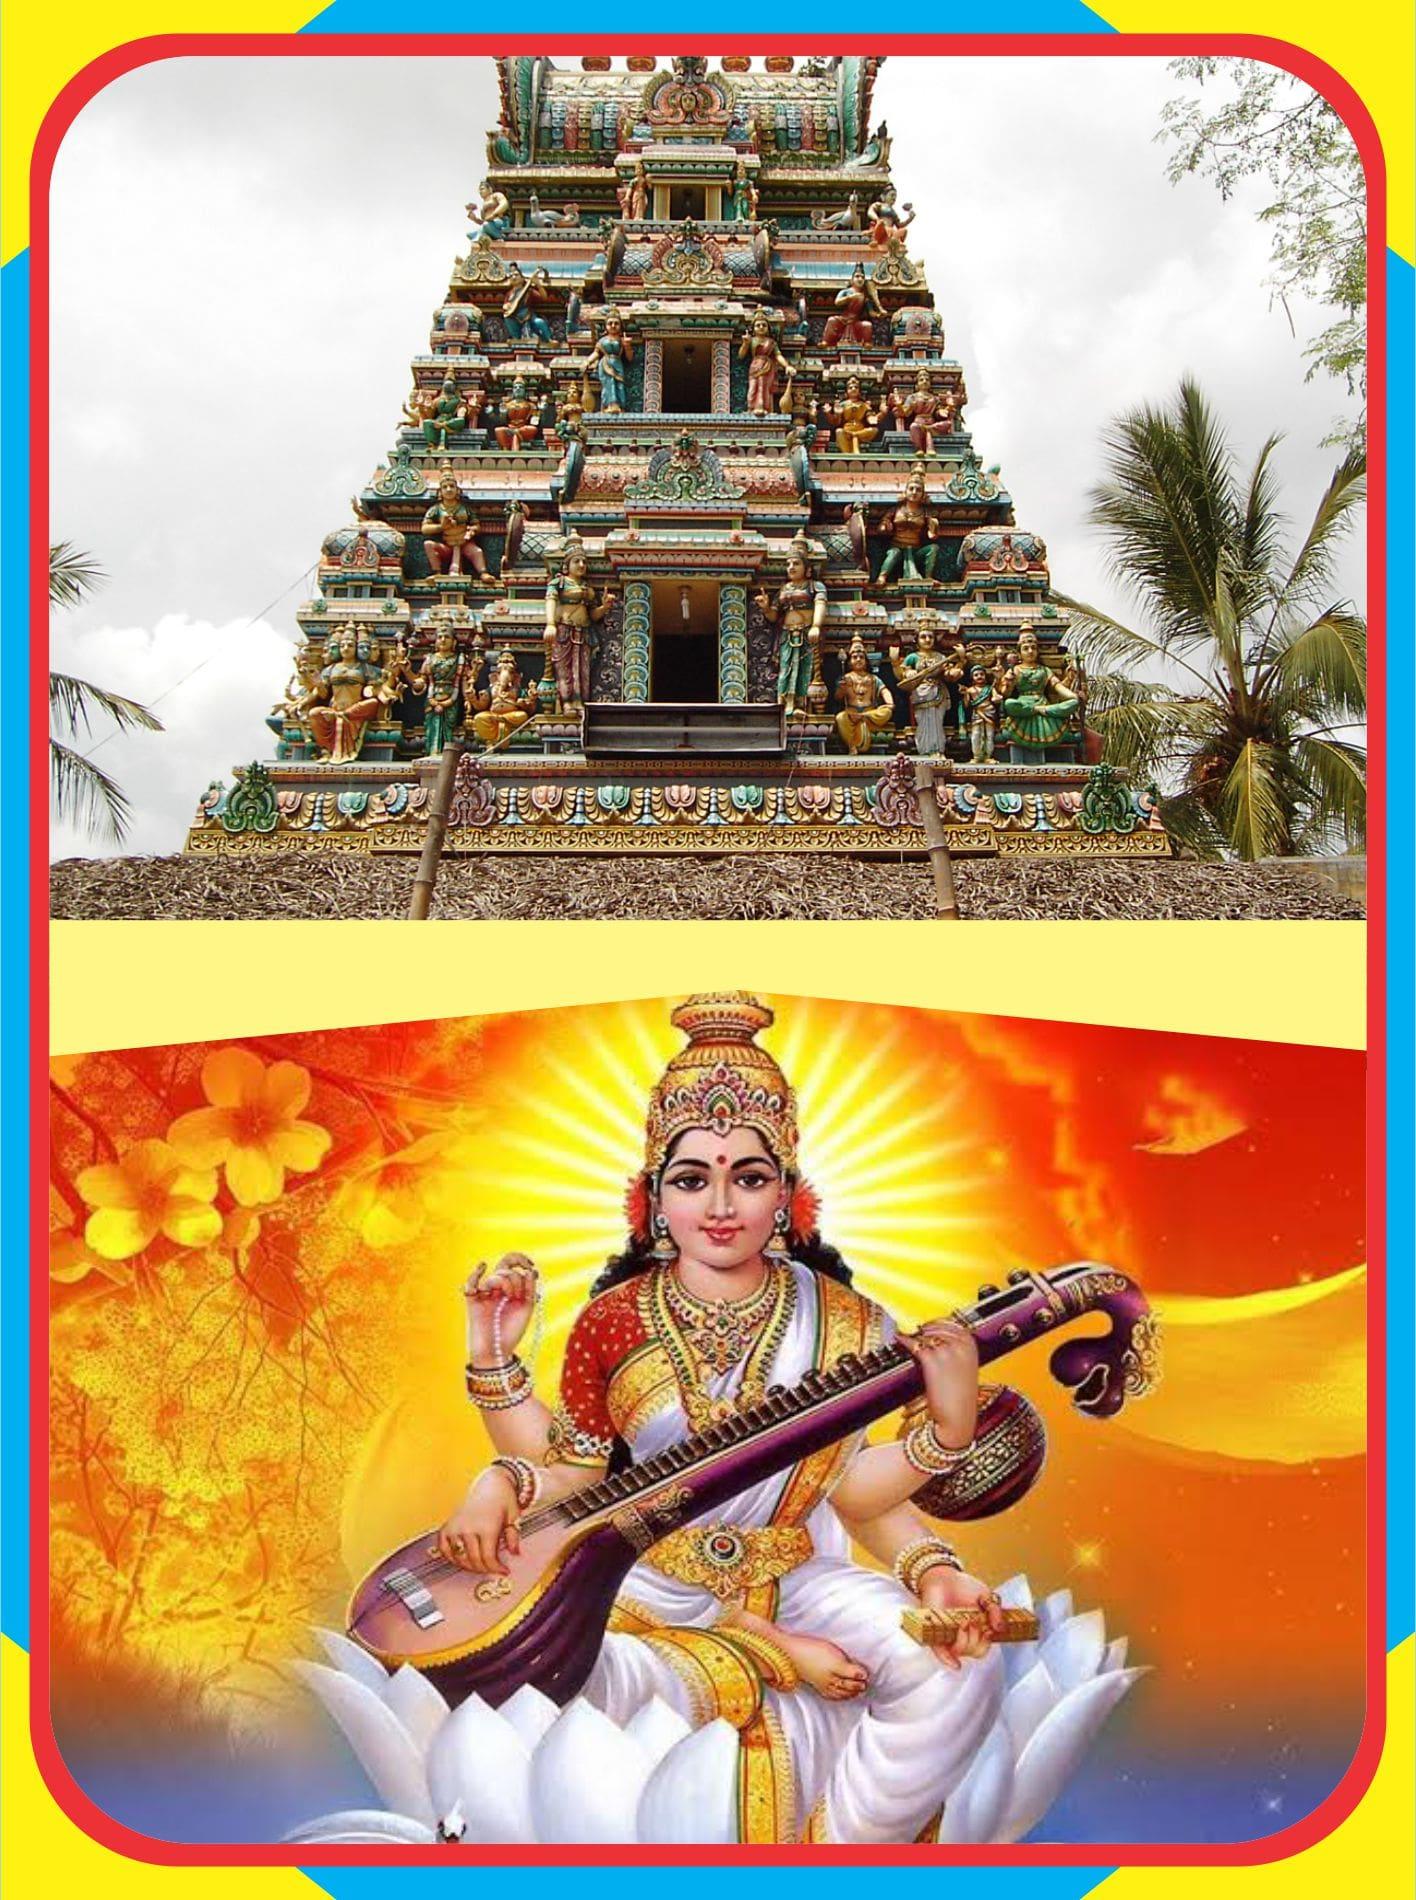 Koothanur – Swaraswathi Temple Abishekam